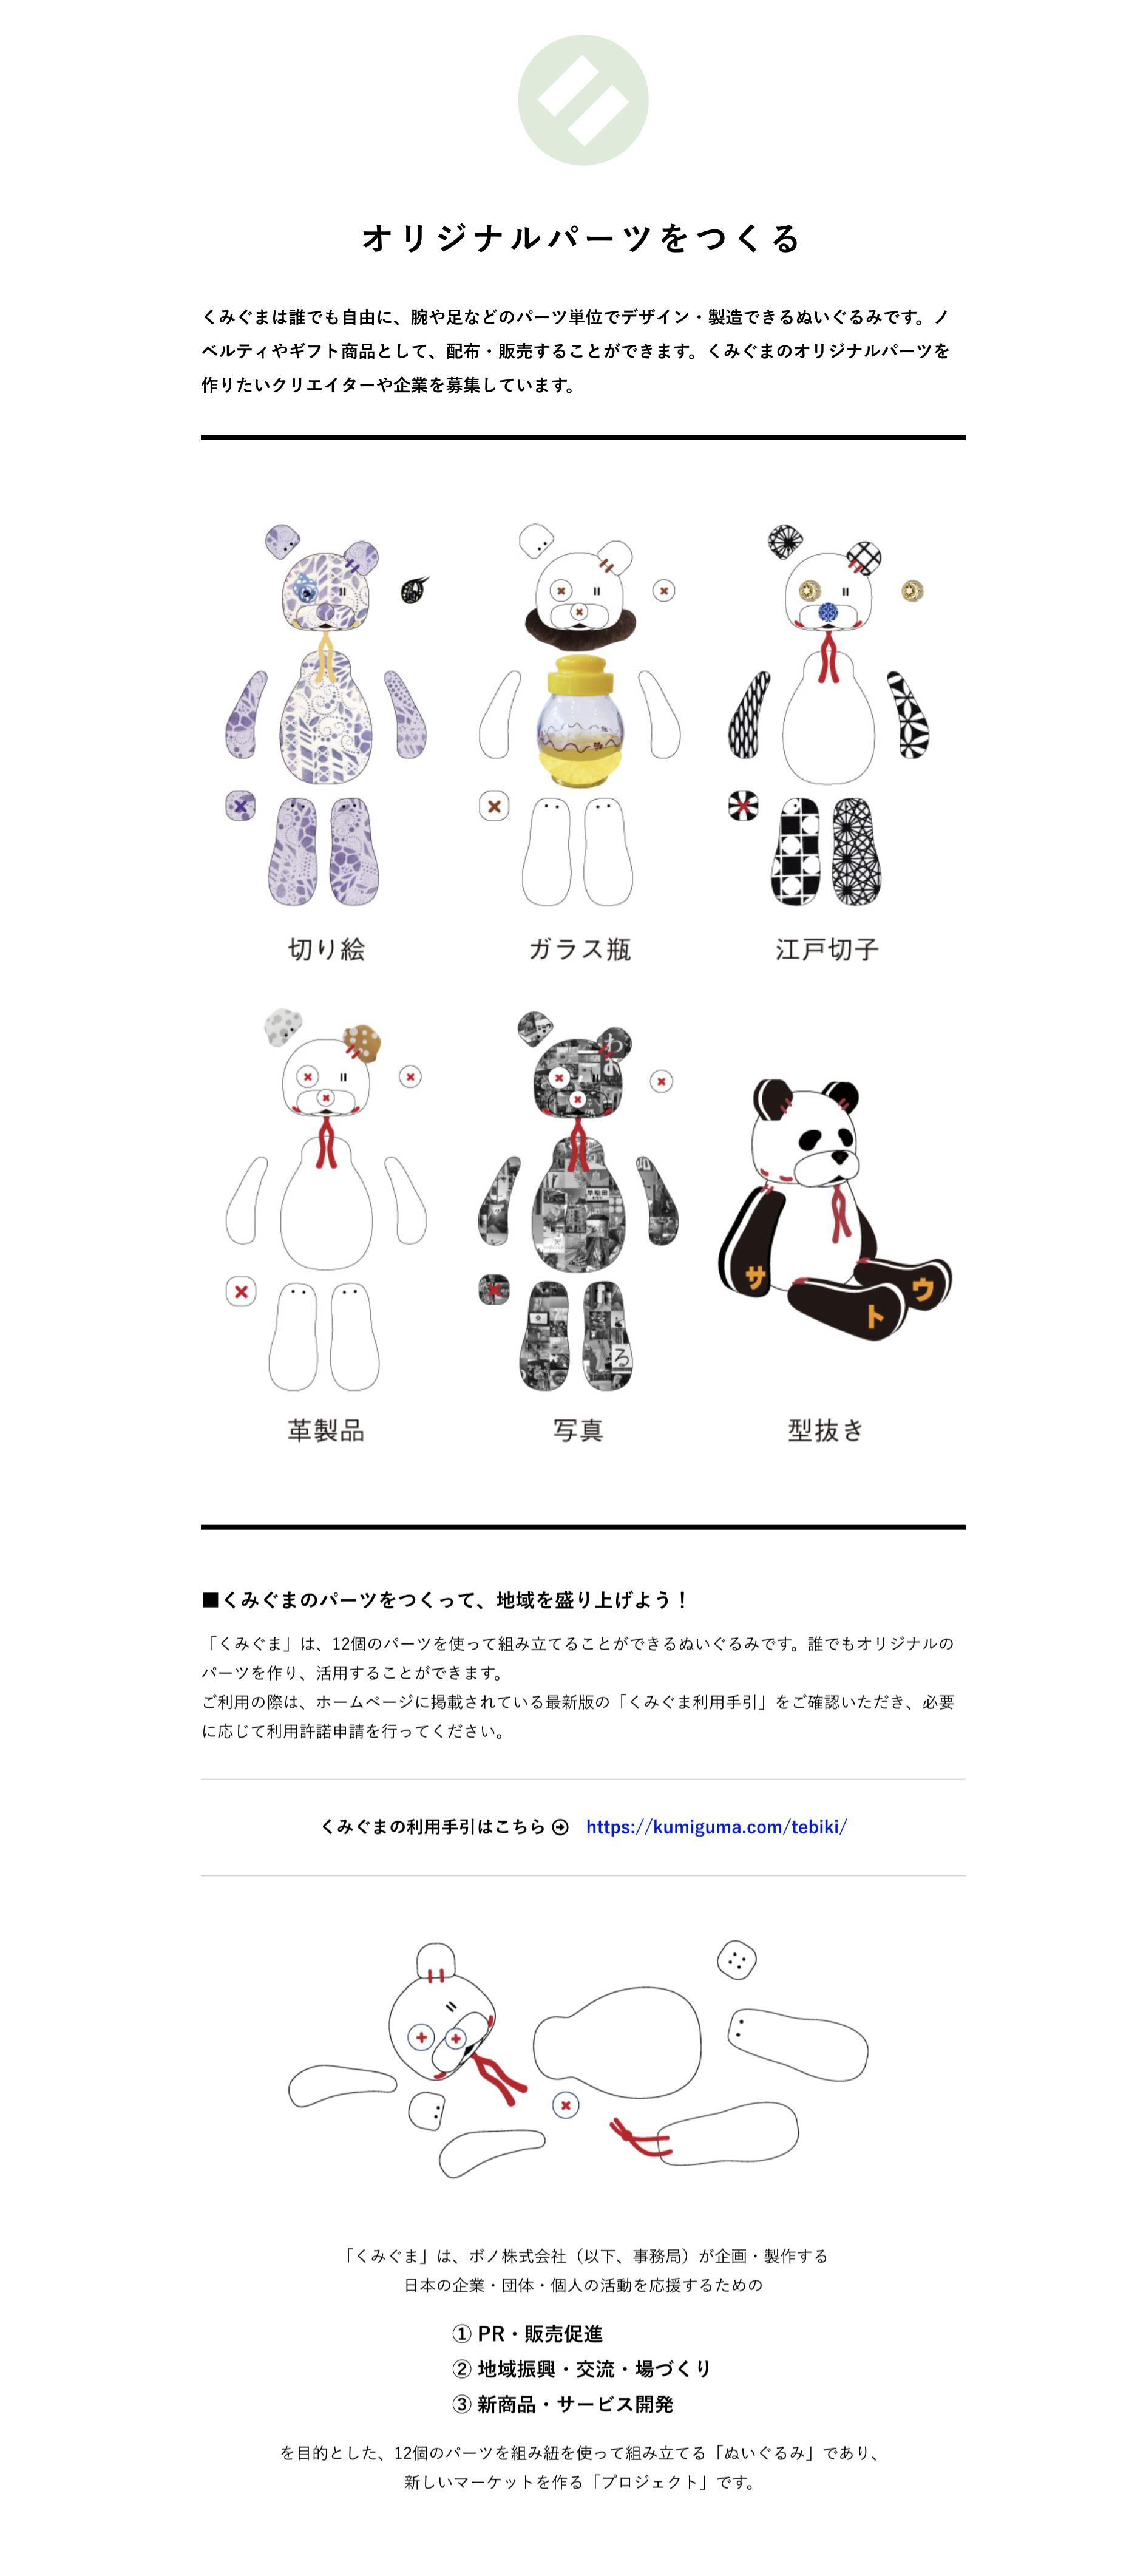 screencapture-kumiguma-tukuru-2018-07-13-14_34_34